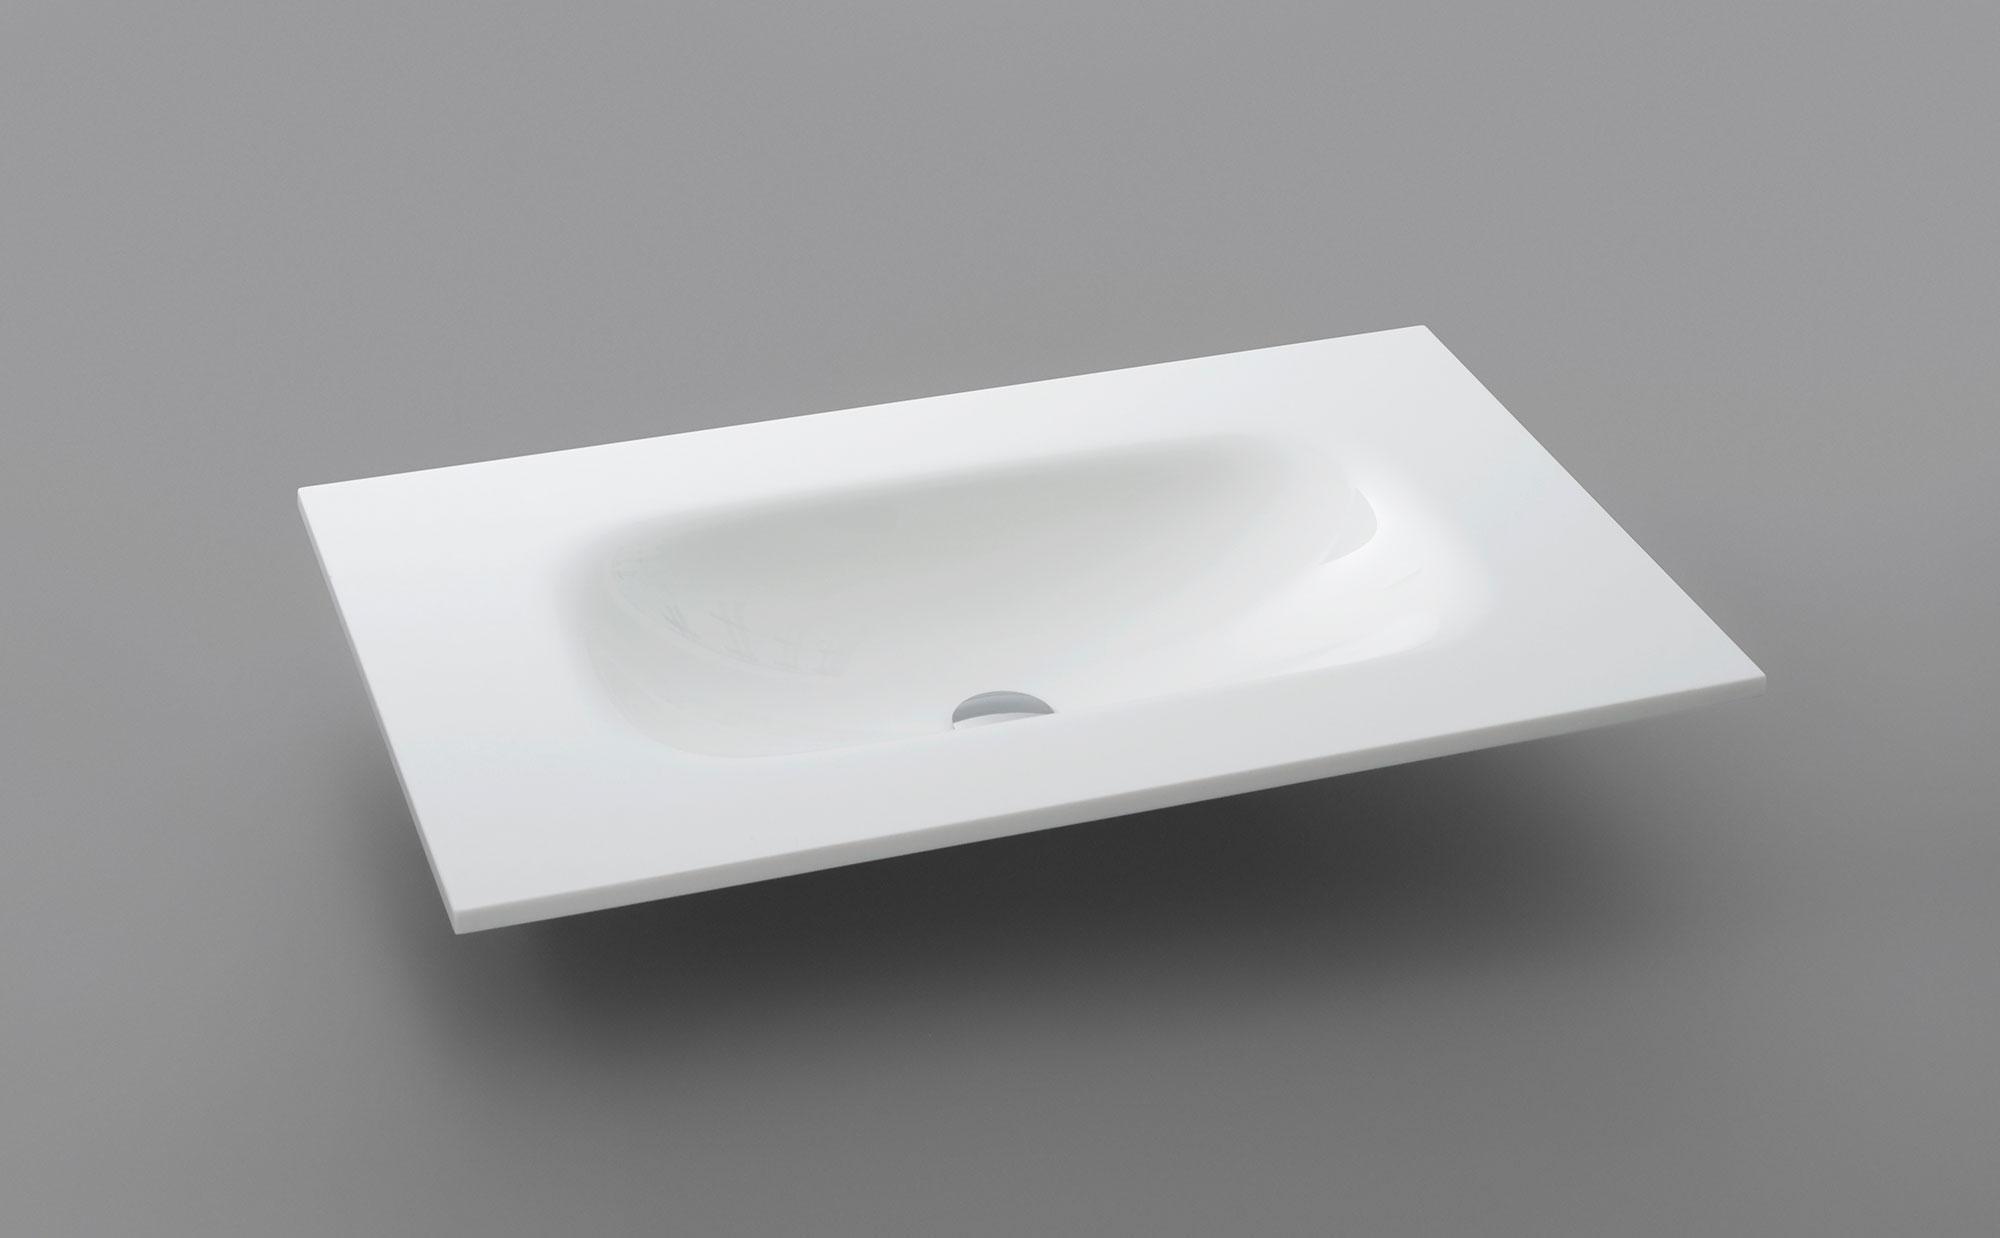 Zen bathroom decor - Basin Top Info Bathroom Design Bathroom S Furnishings Led